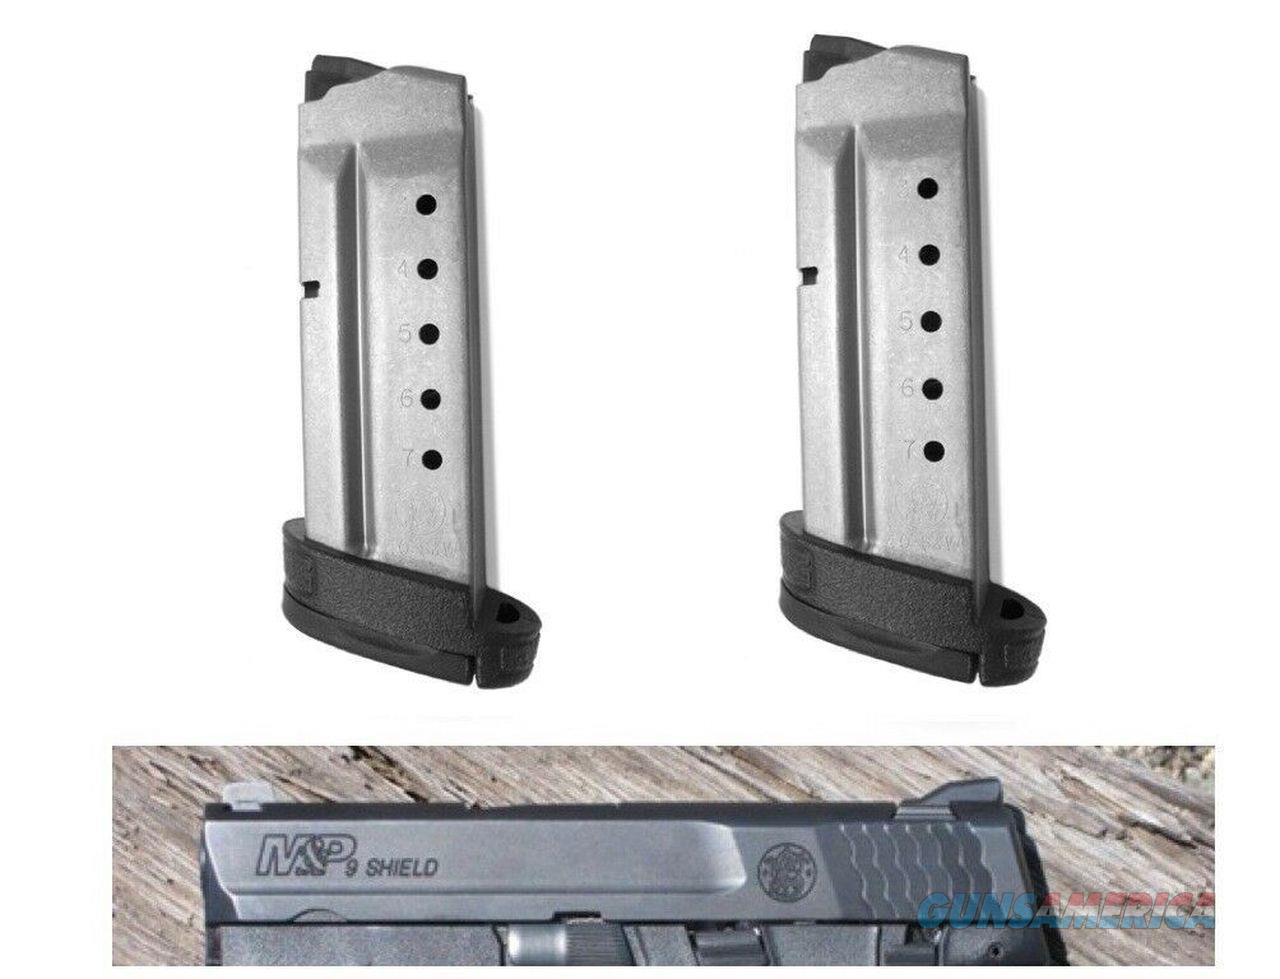 2 Pack M&P Shield 7 Round .40 40 EXTENDED Magazine Mag Magazine Smith & Wesson  Non-Guns > Ammunition